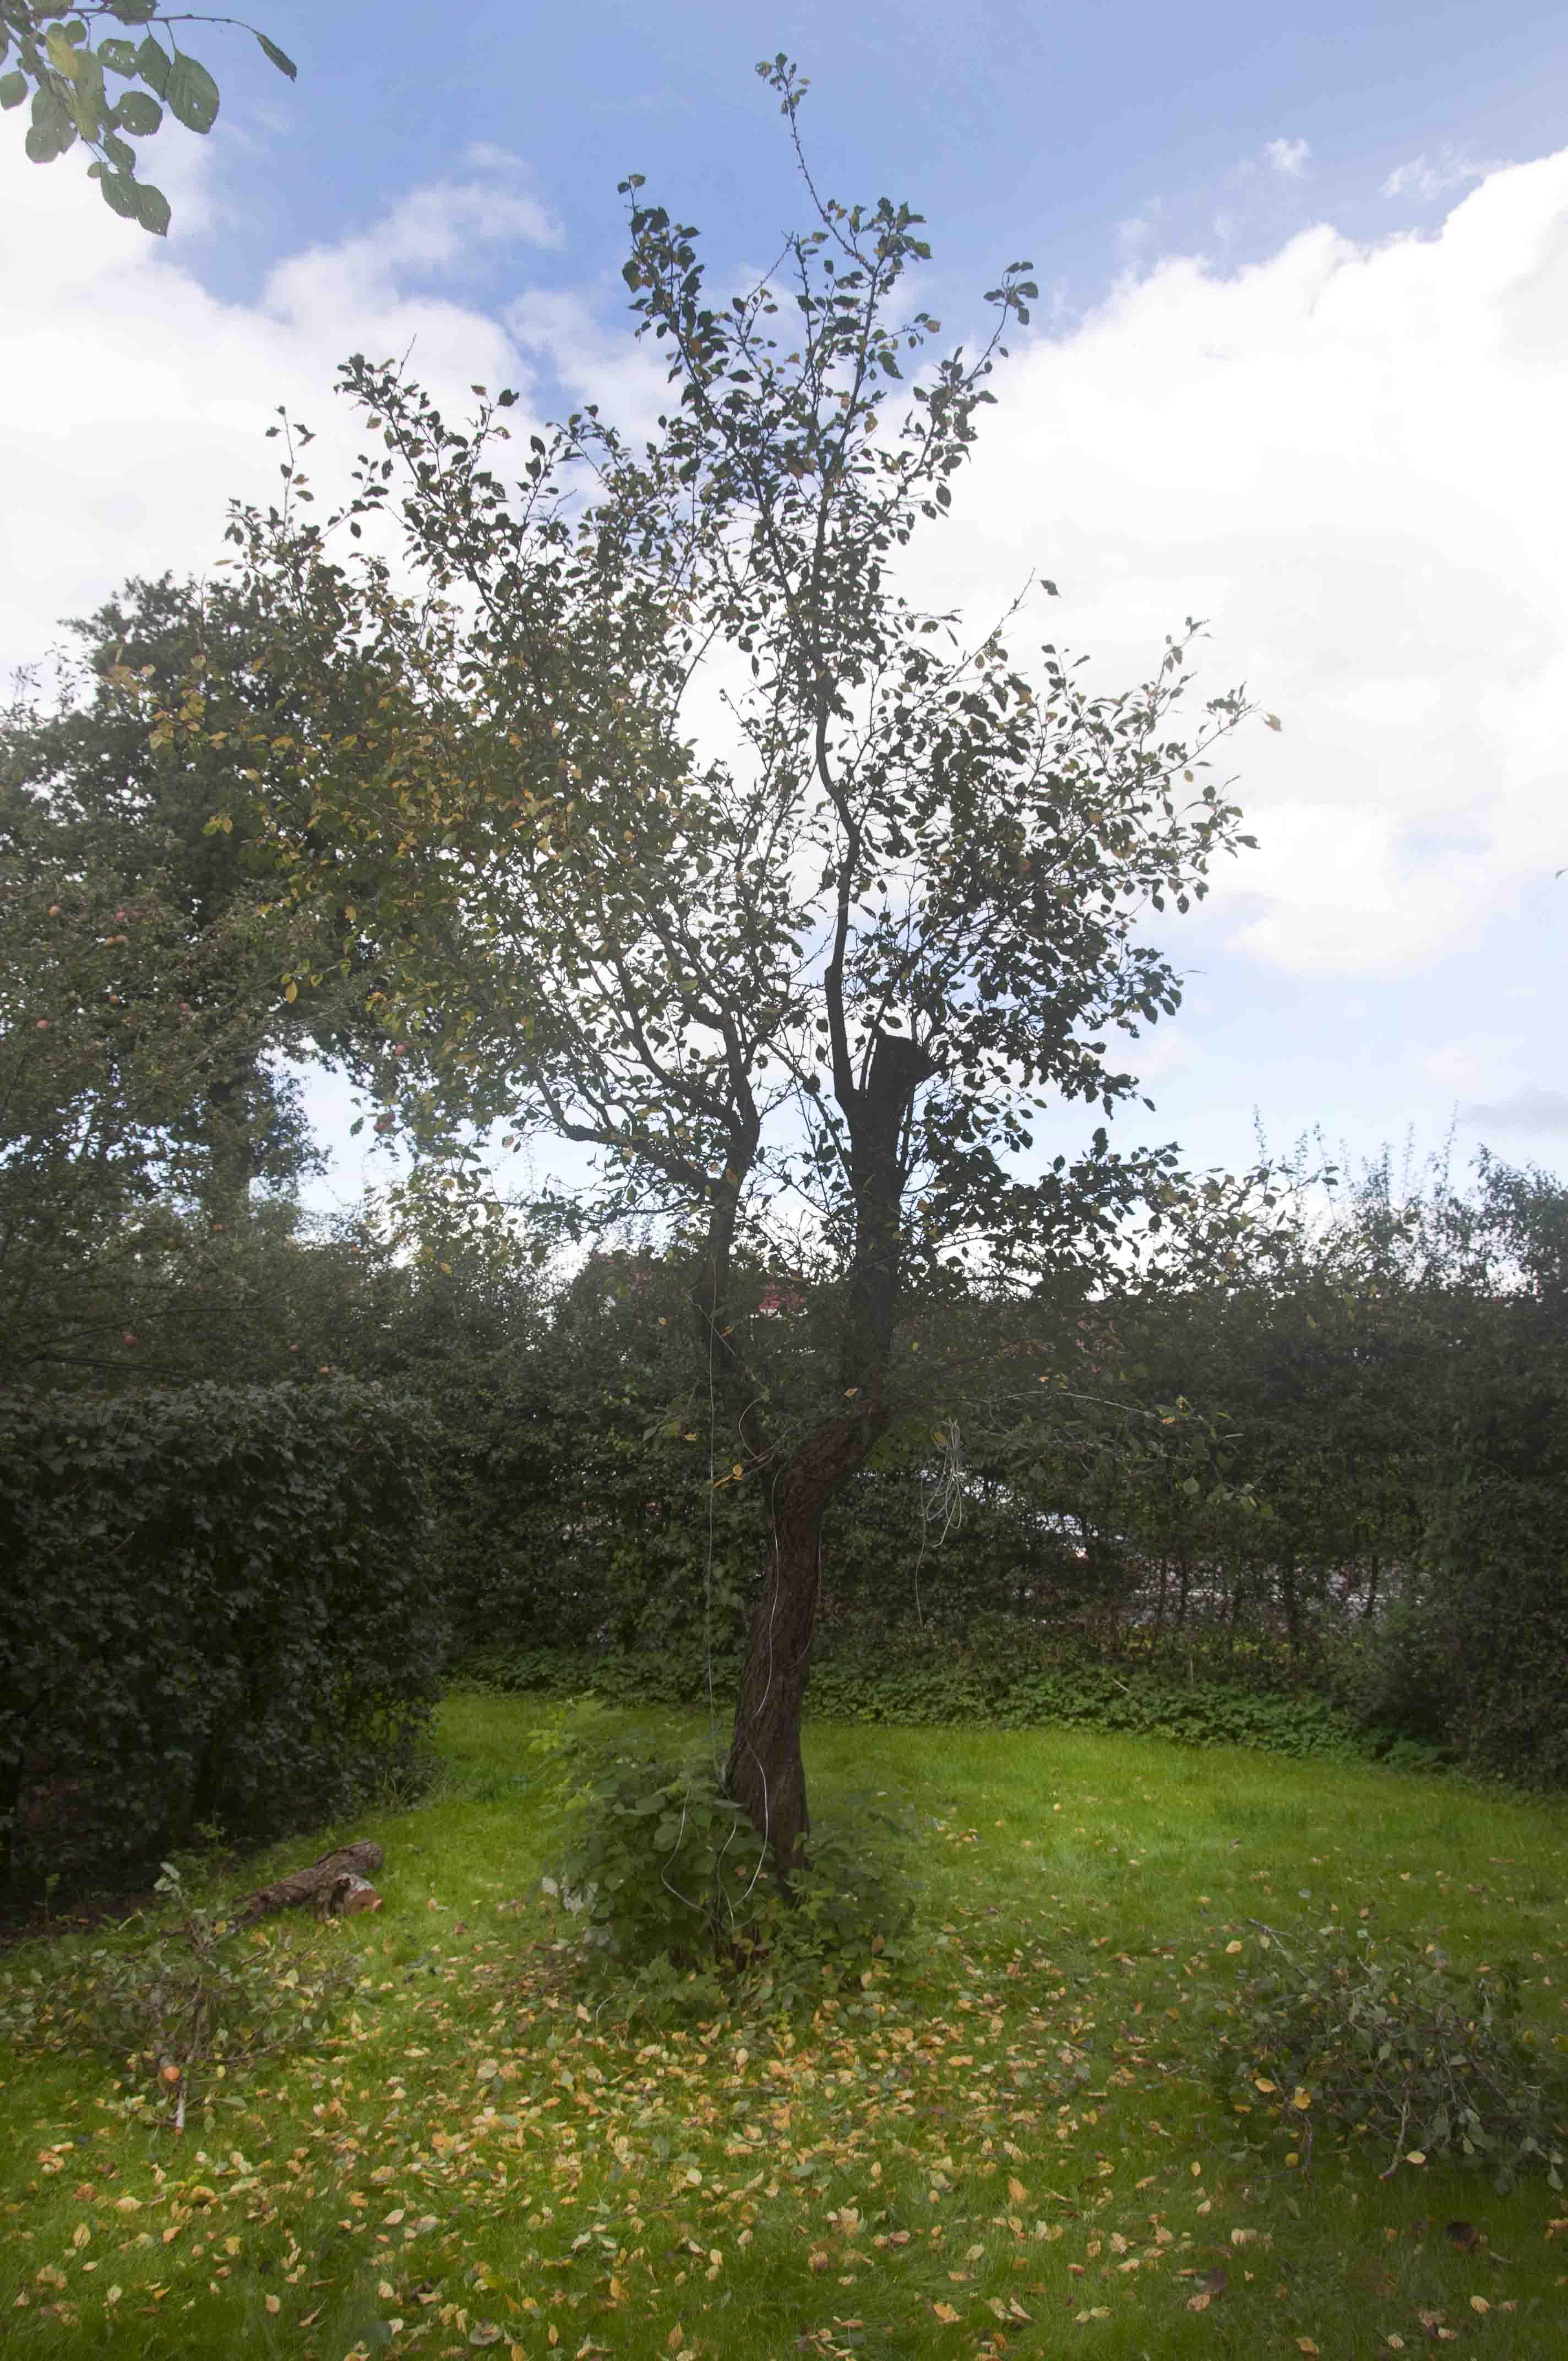 2015 09 19 HSB Steenwijk 5981